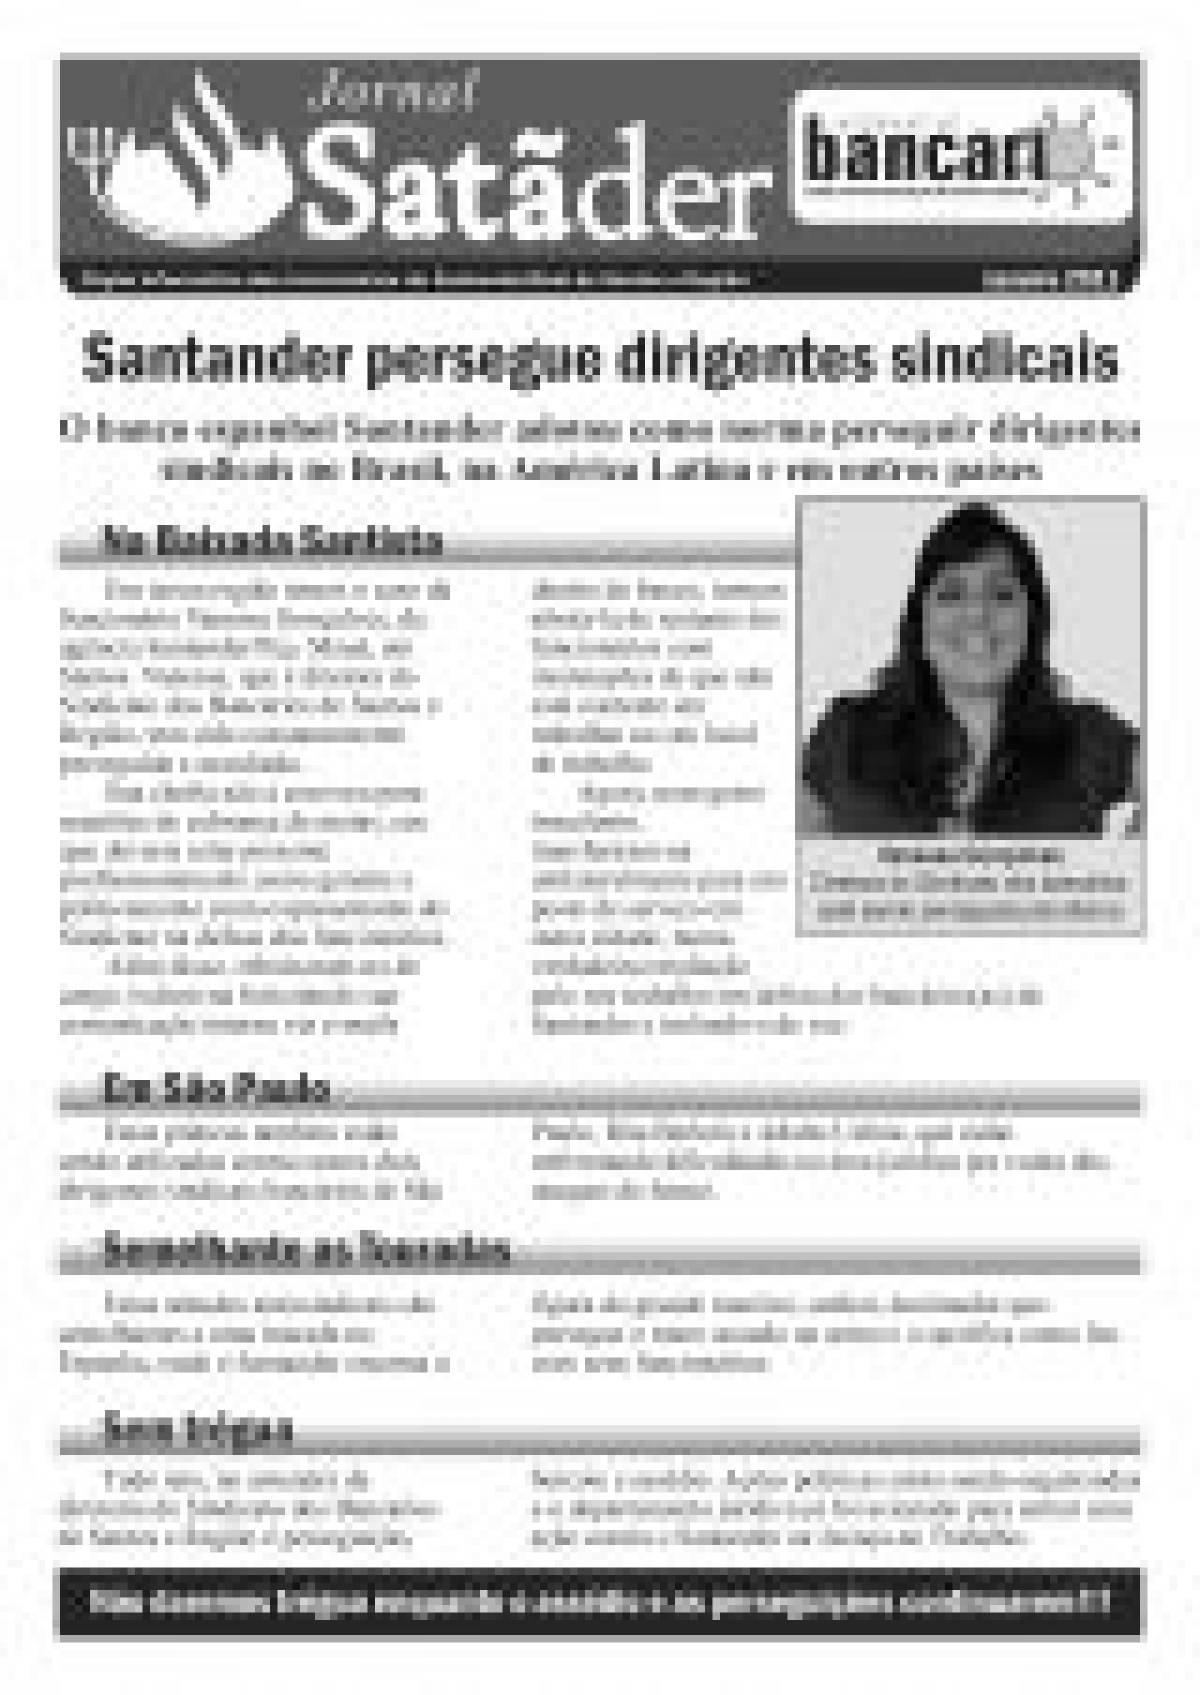 Santander persegue dirigentes sindicais